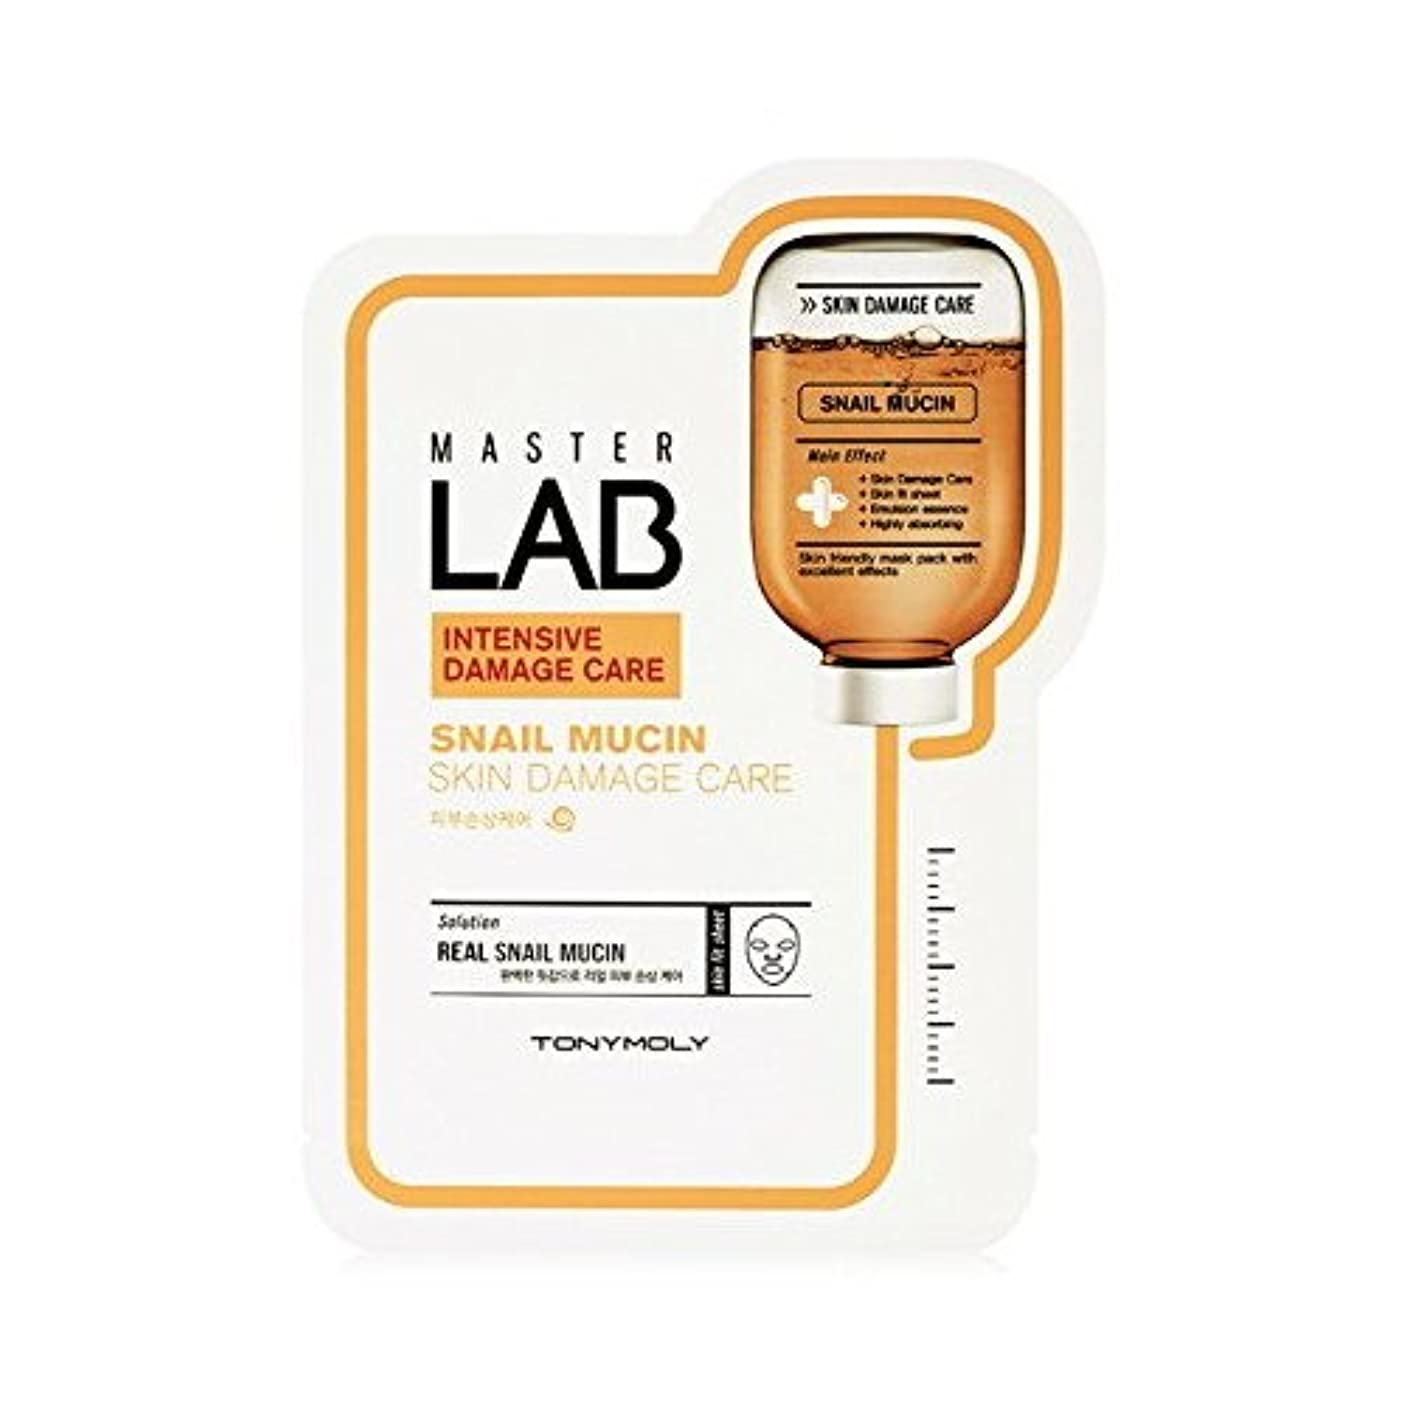 (6 Pack) TONYMOLY Master Lab Mask - Snail Mucin (Skin Damage Care) (並行輸入品)